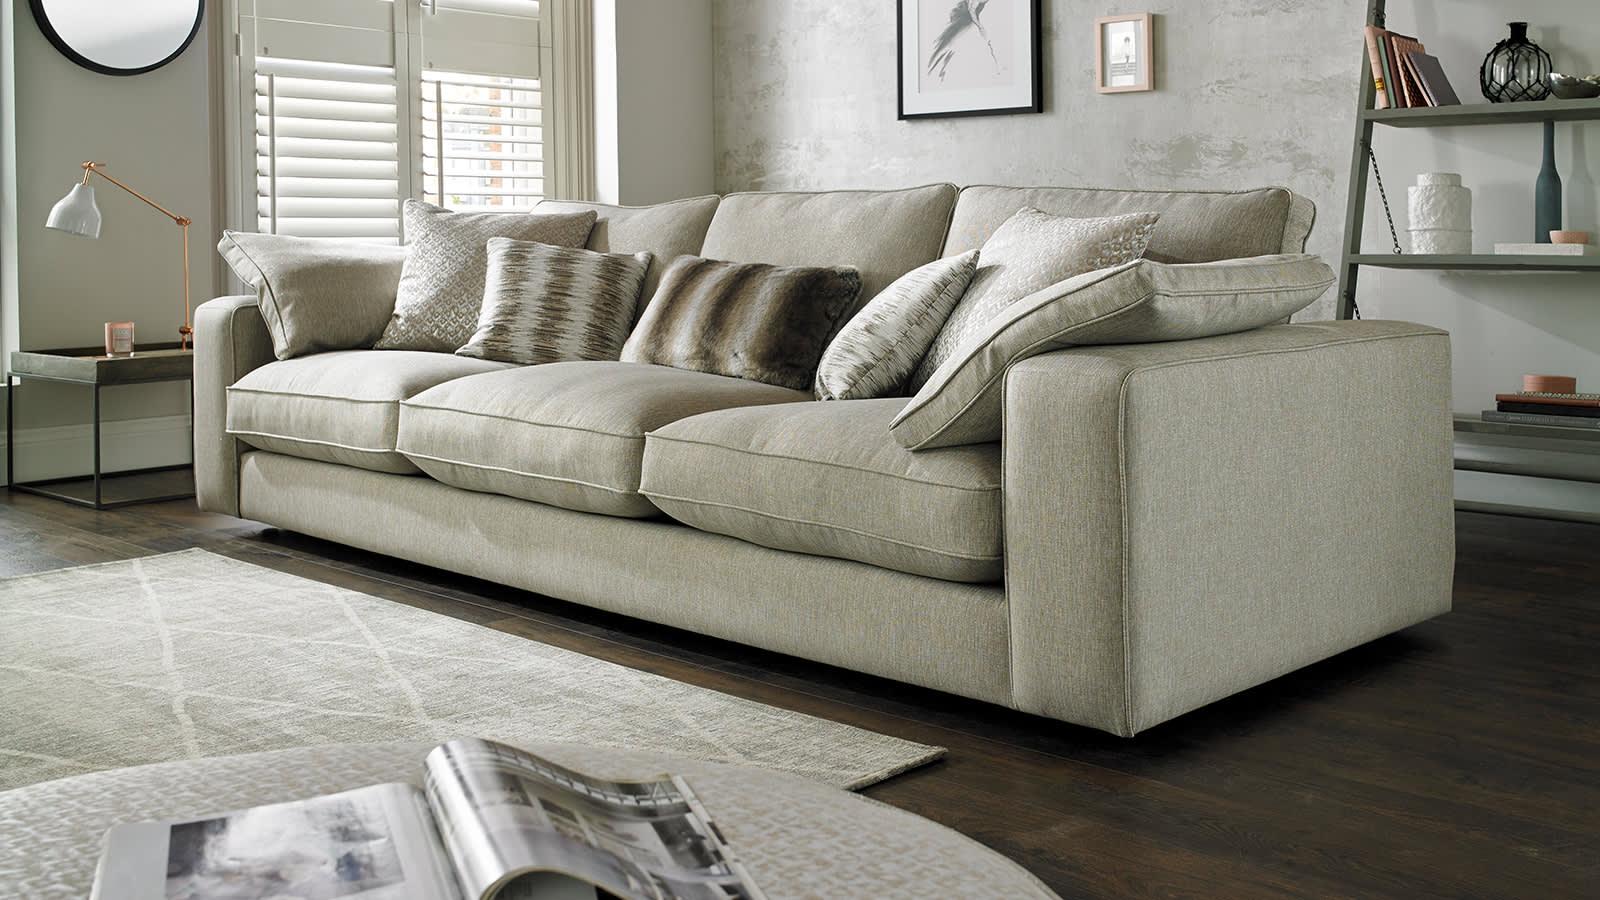 Beige fabric Autograph sofa